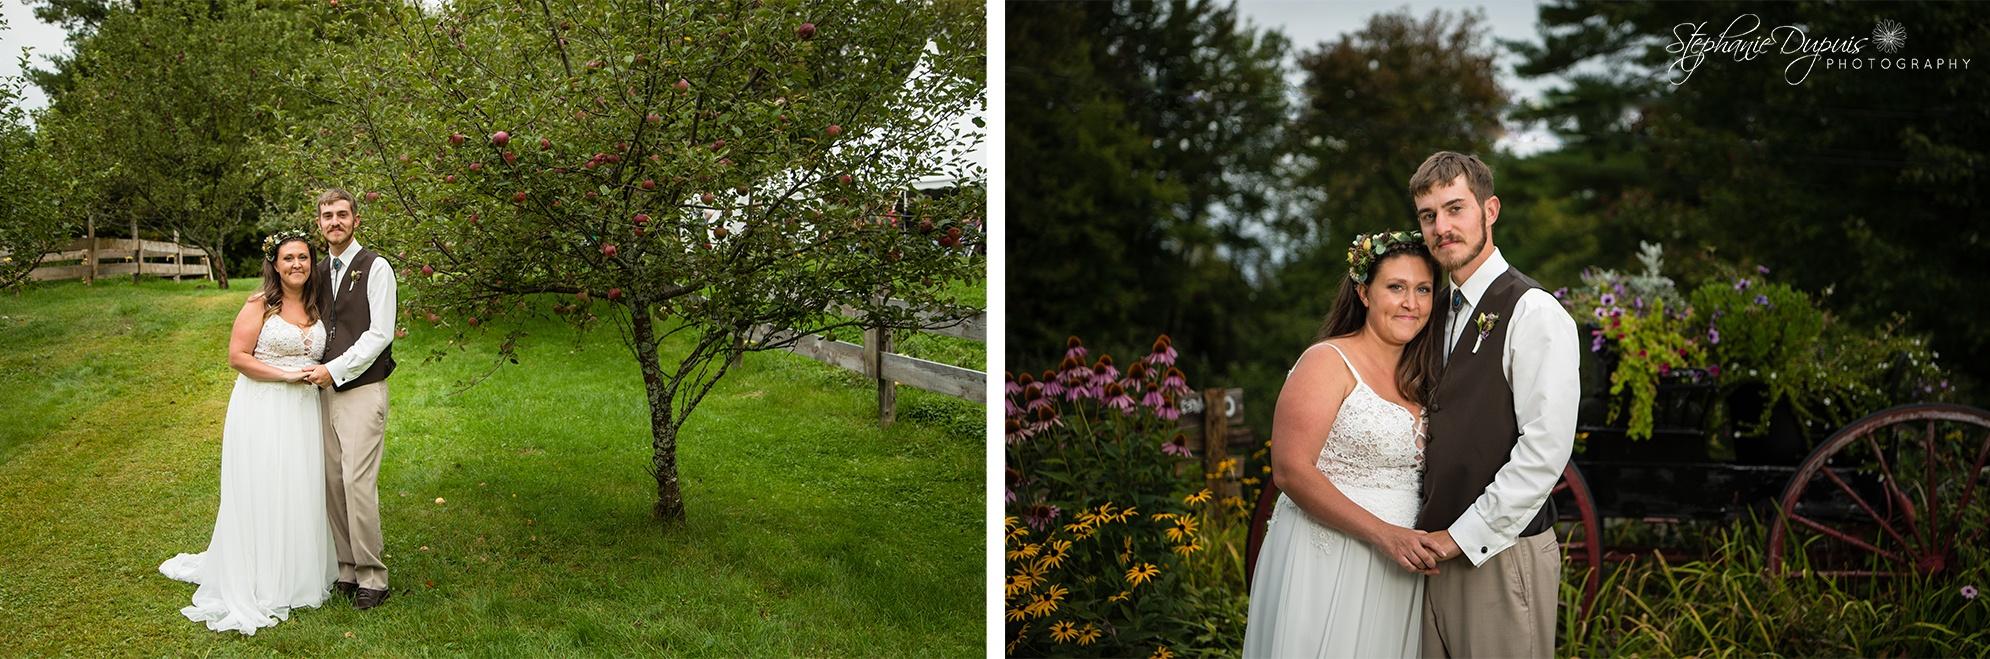 Hicks Wedding 11 - Portfolio: Hick's Wedding